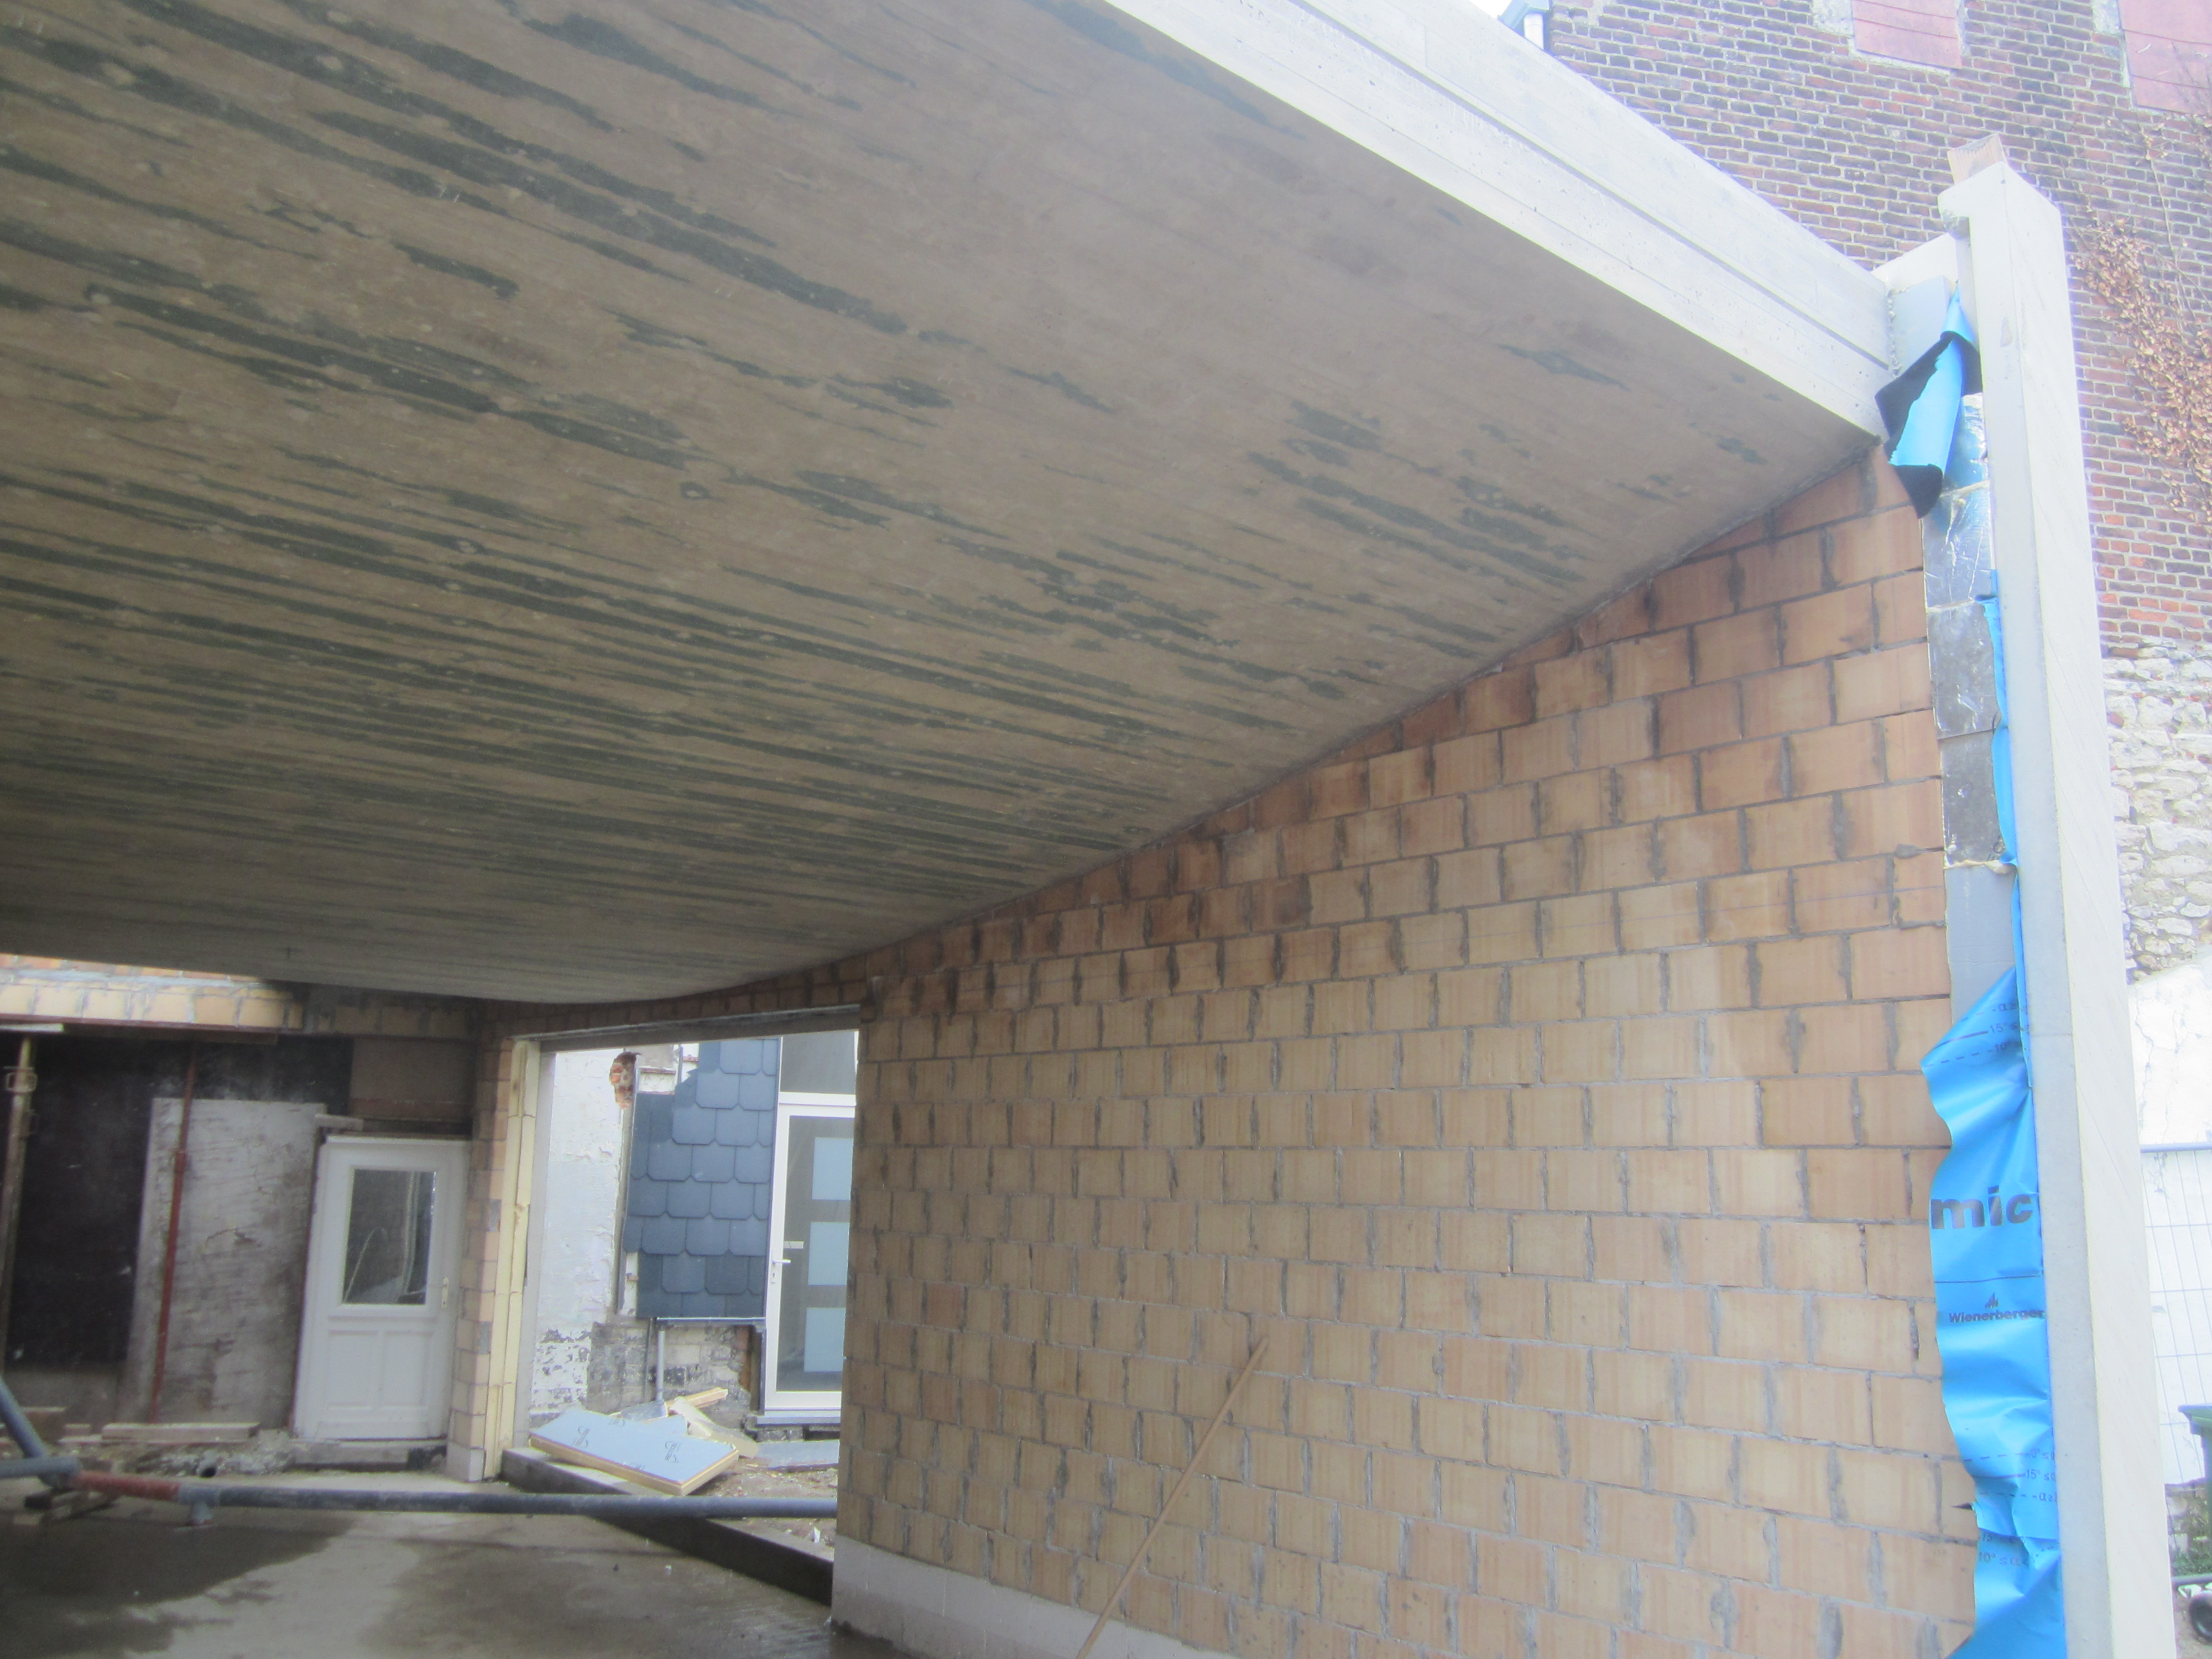 Gebogen Plafond in Beton